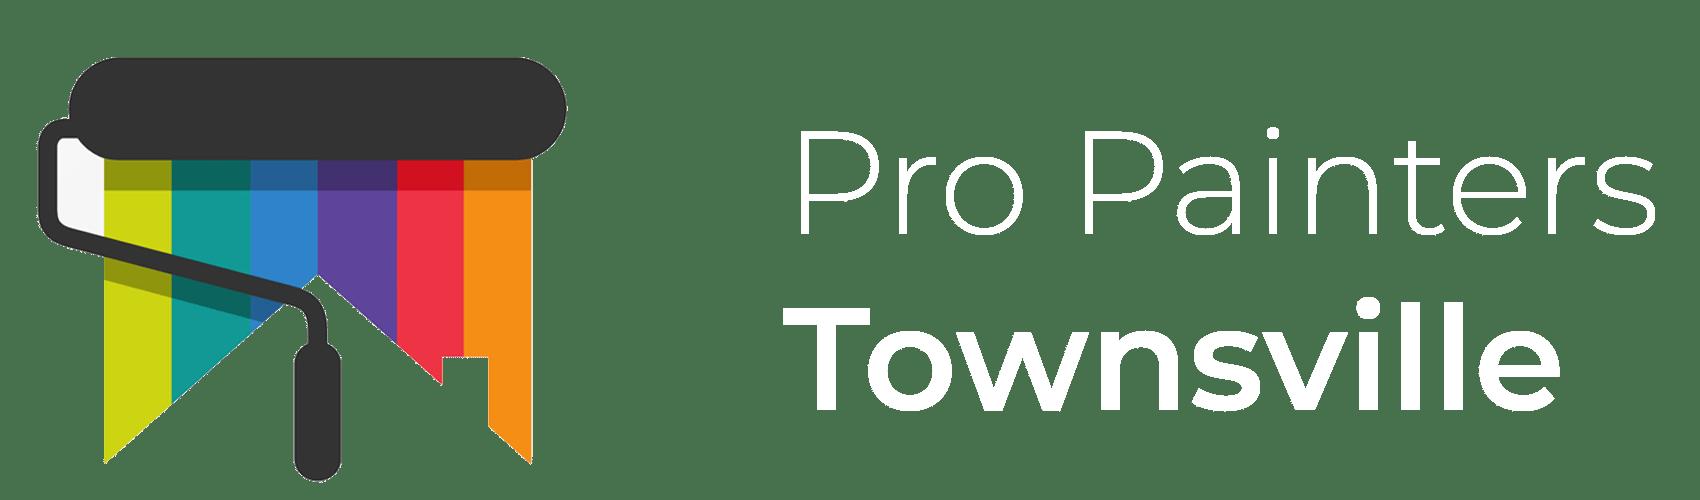 Pro Painters Townsville LOGO